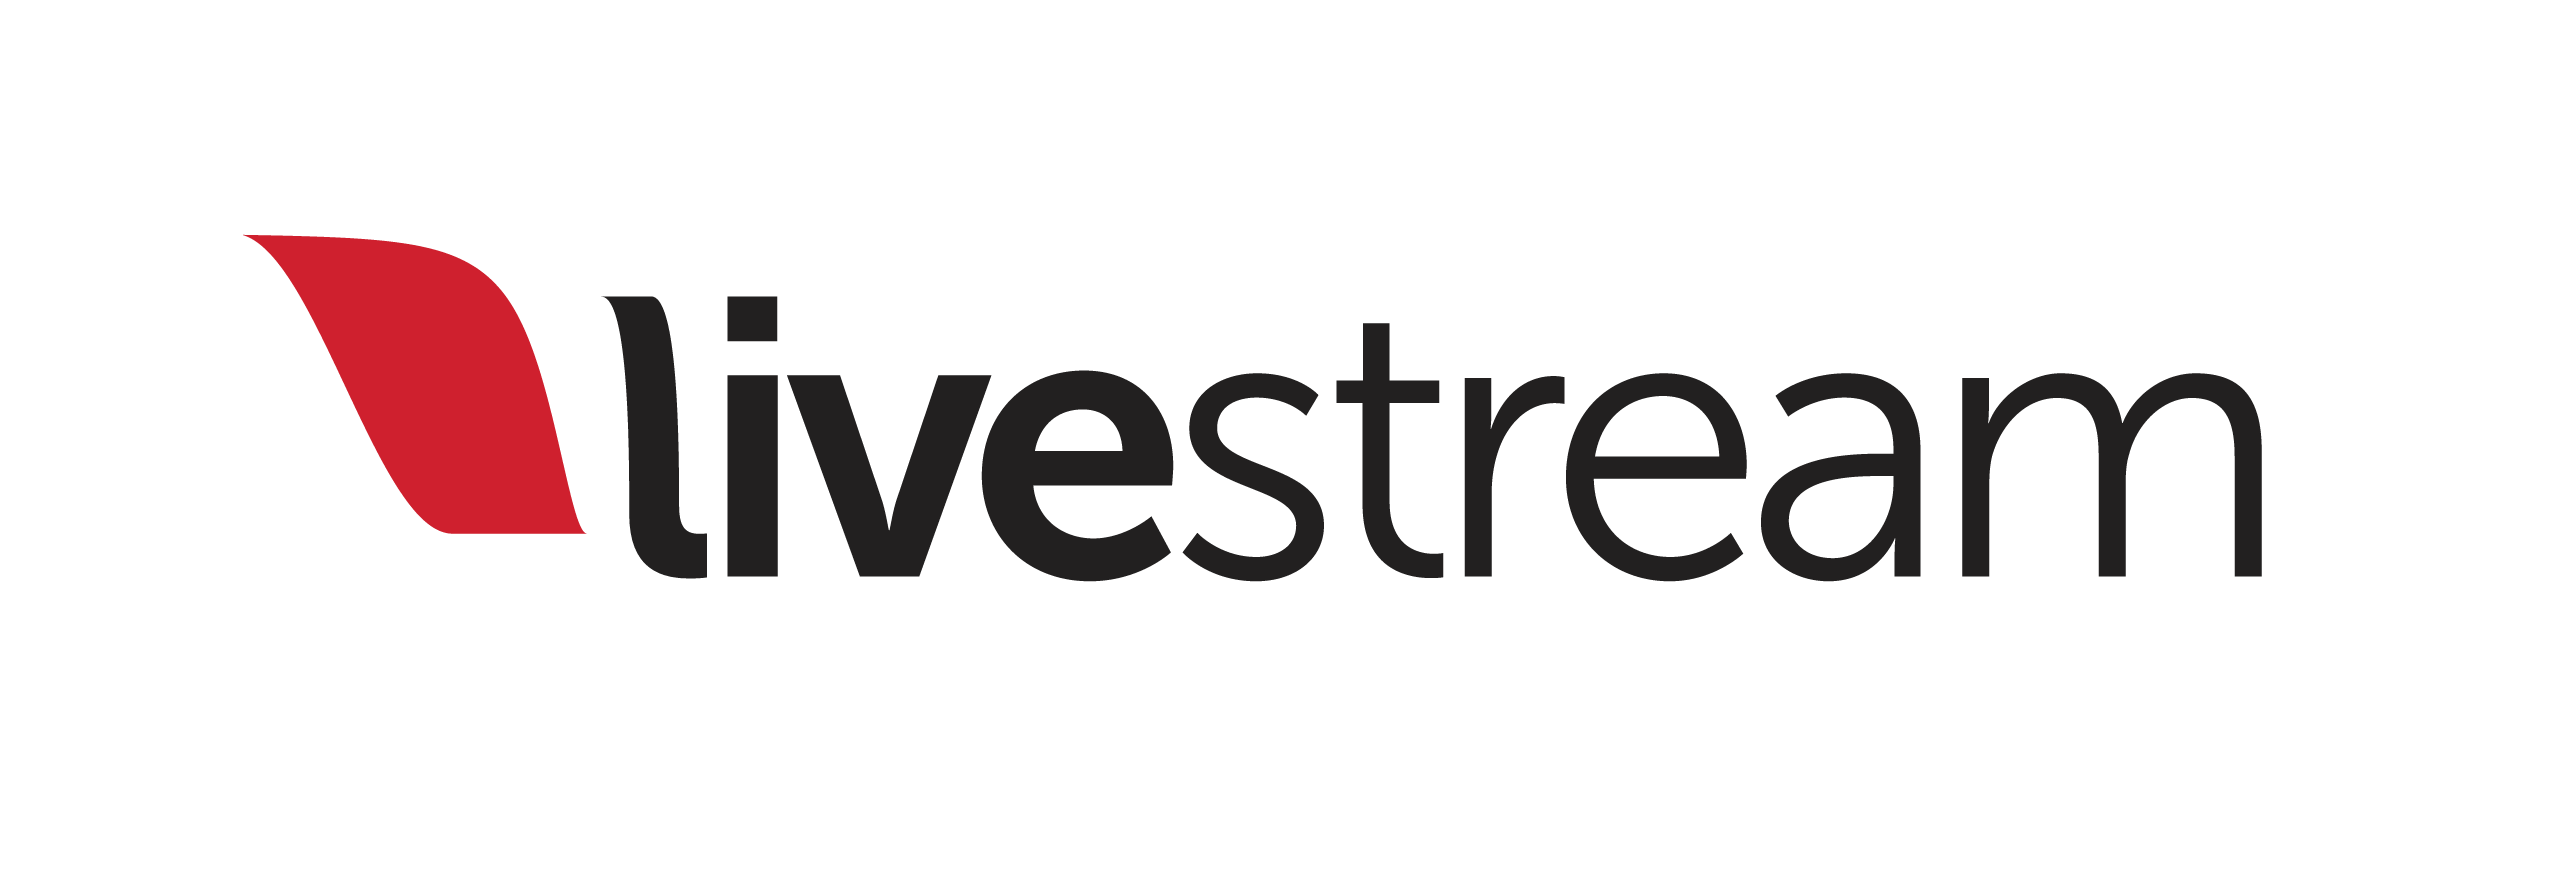 Livestream alternative